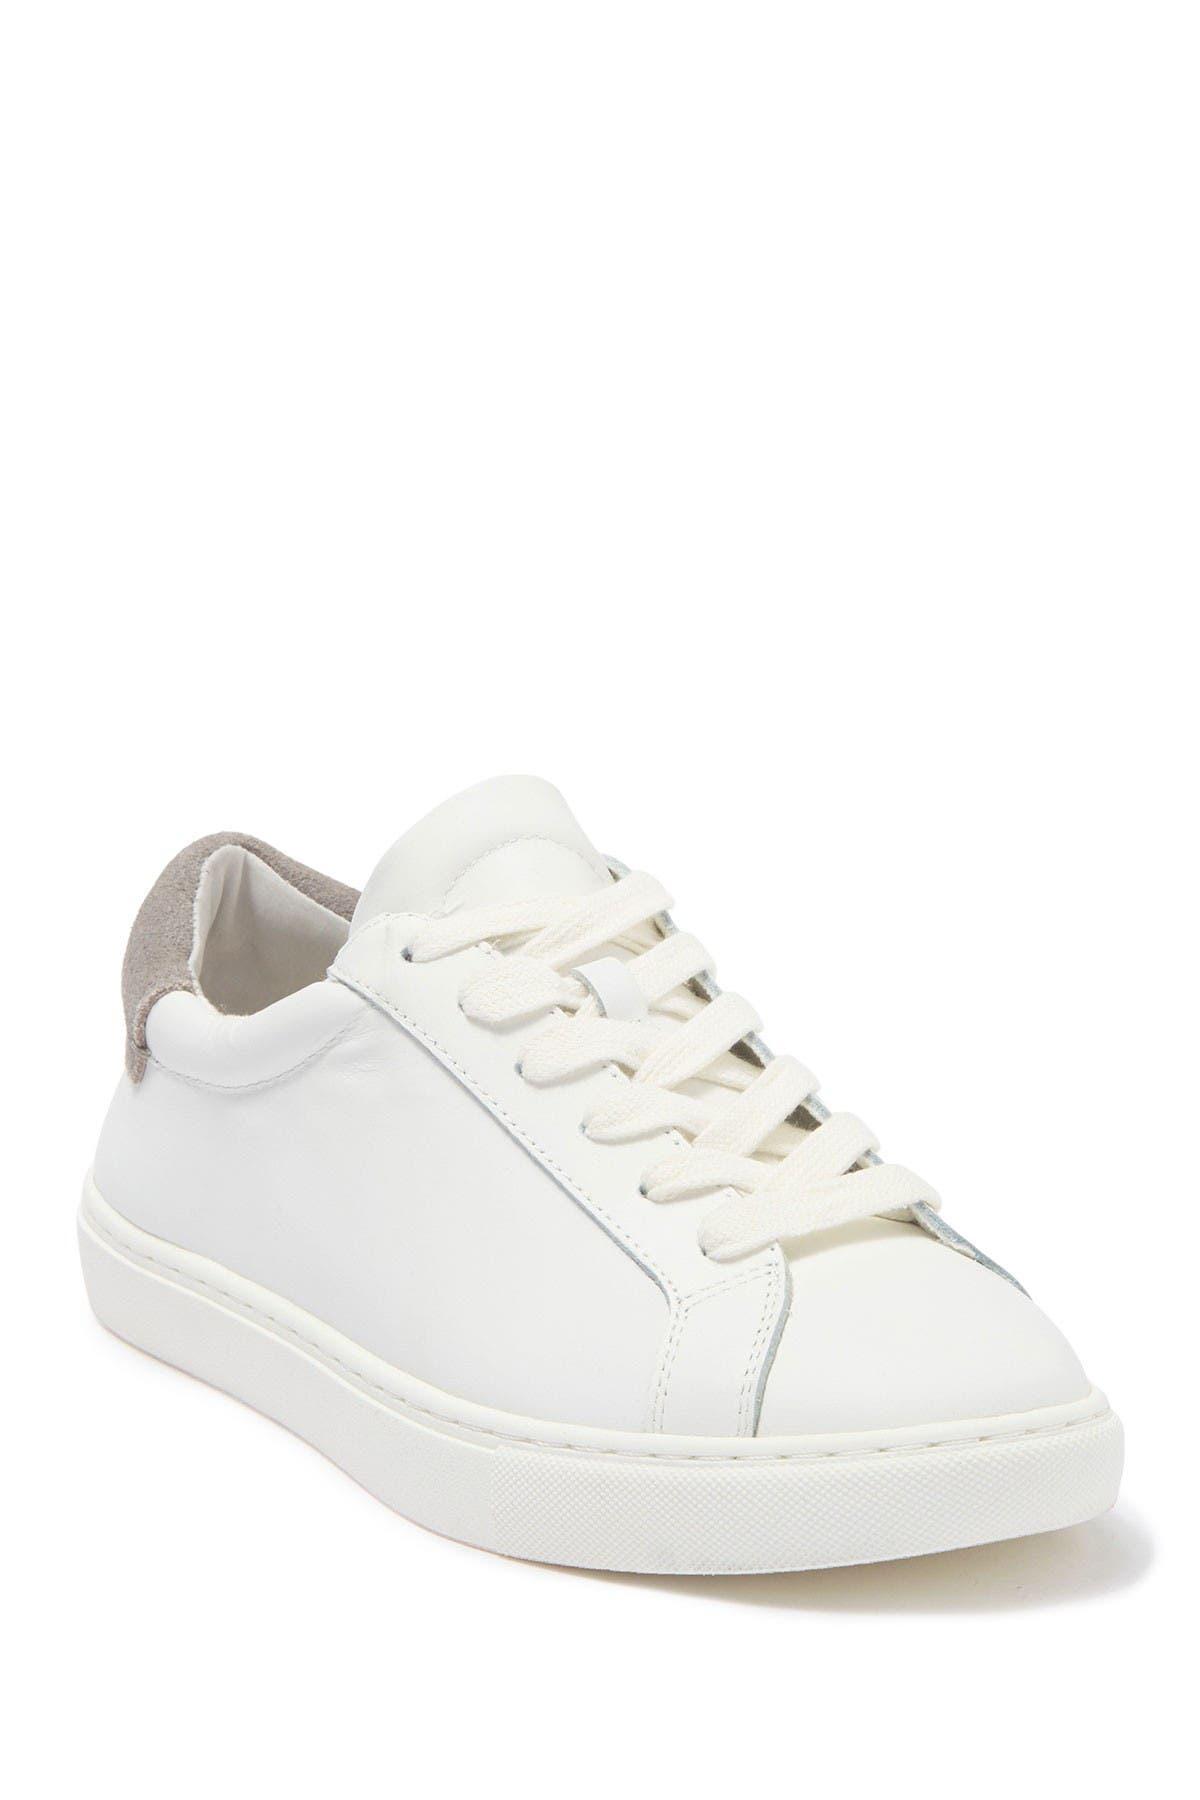 Image of Sam Edelman Lupita Low Profile Sneaker